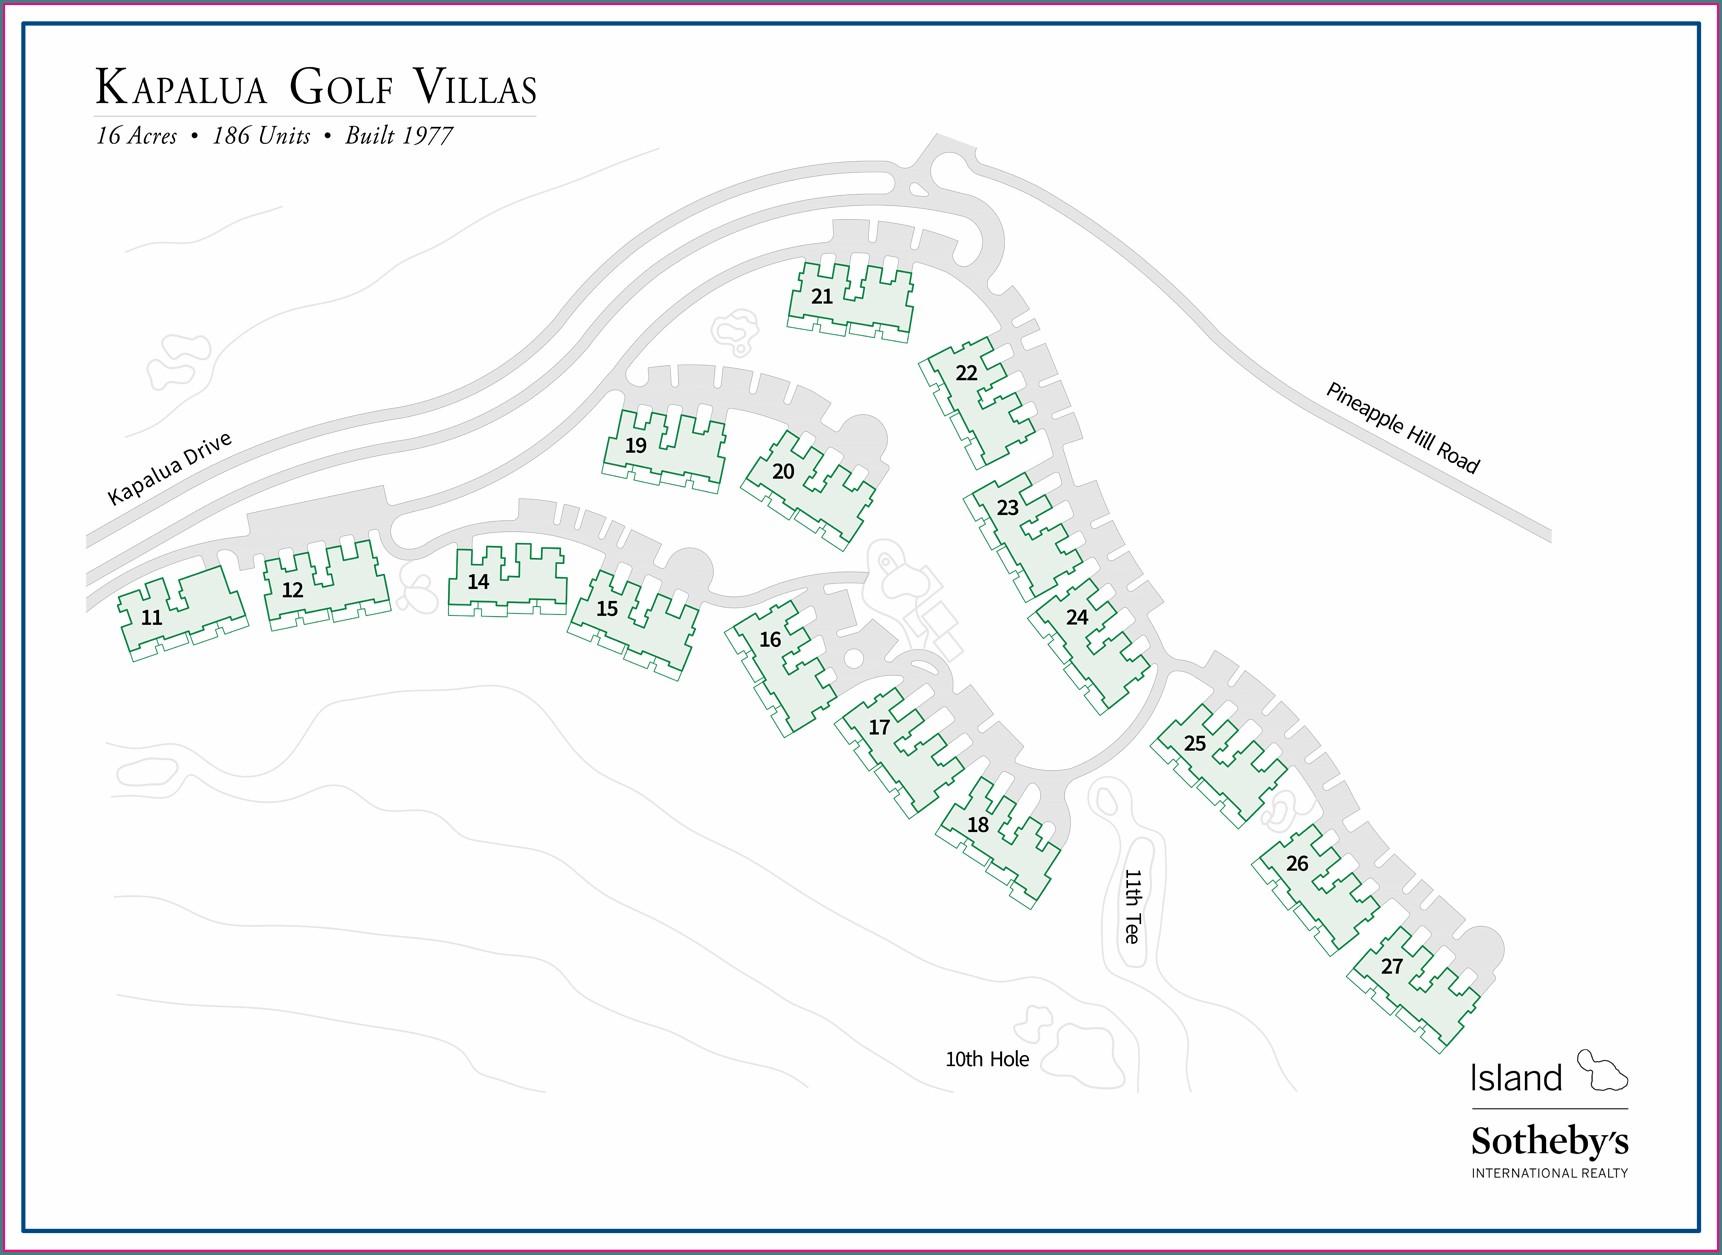 Kapalua Golf Villas Site Map